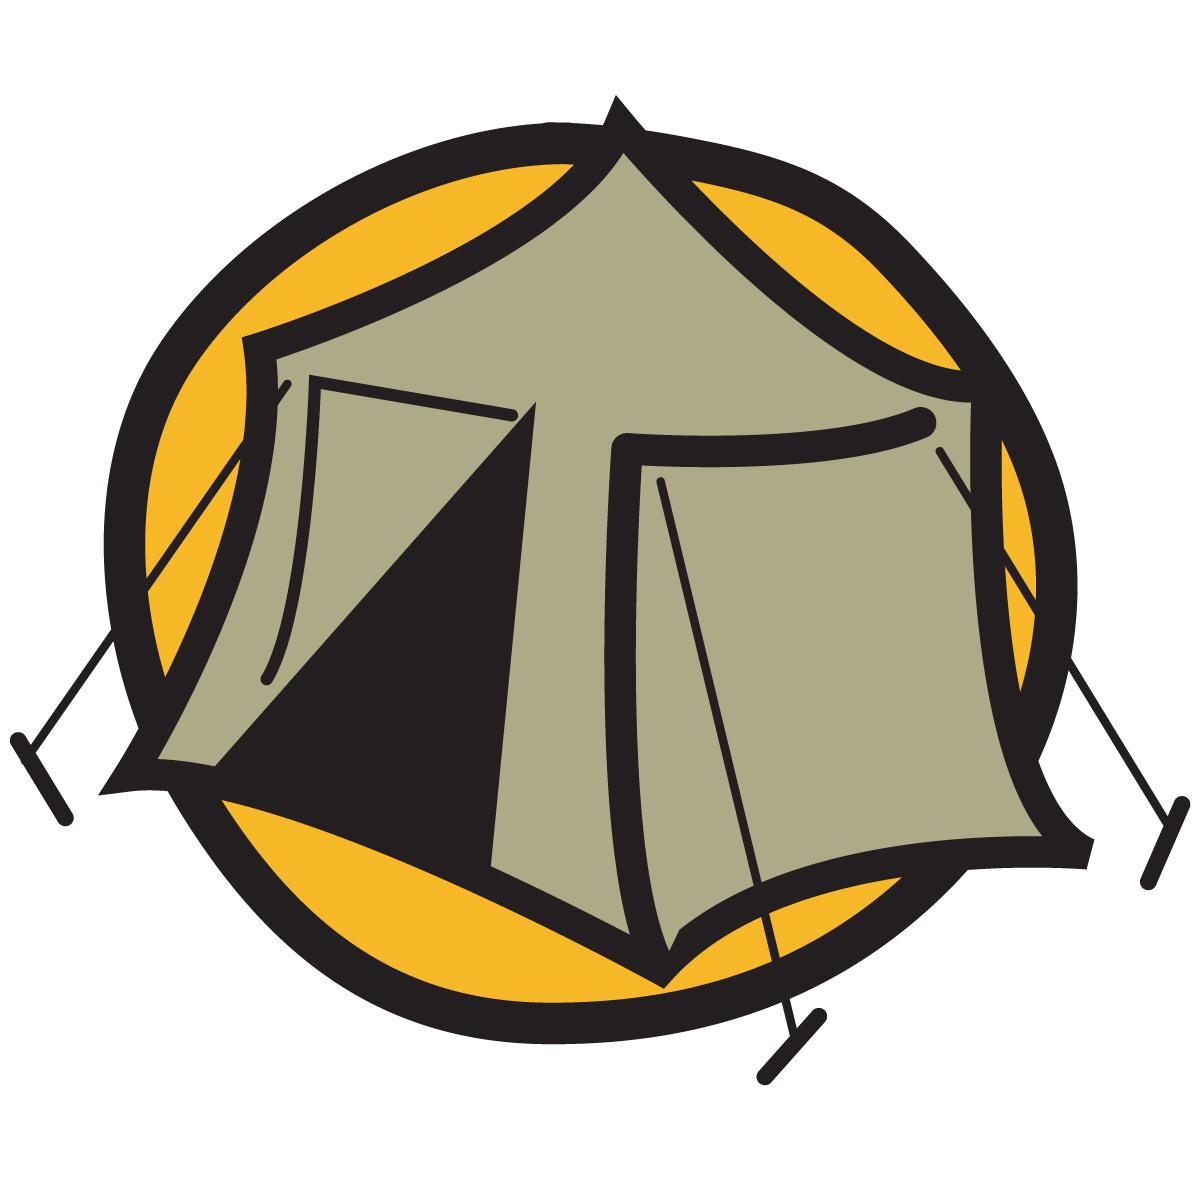 1200x1200 Campfire Camp Fire Clip Art Image 9